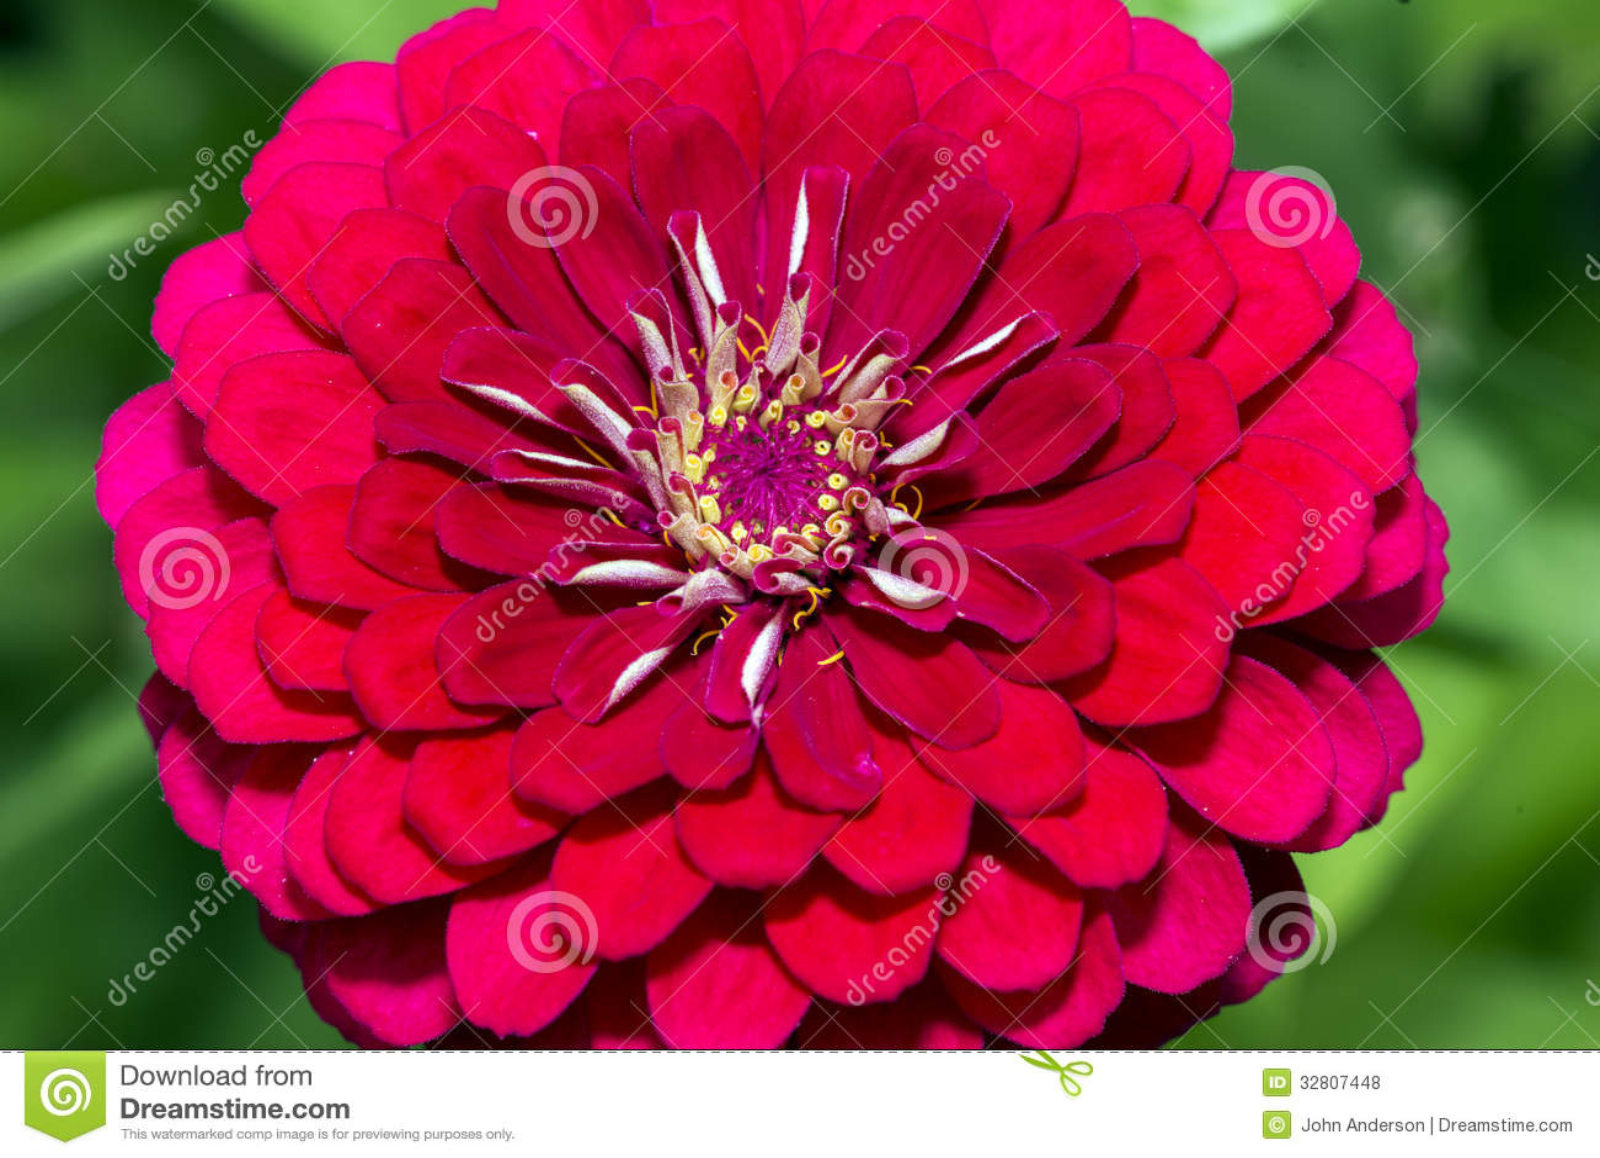 Dahlia is a genus of bushy tuberous herbaceous perennial plants